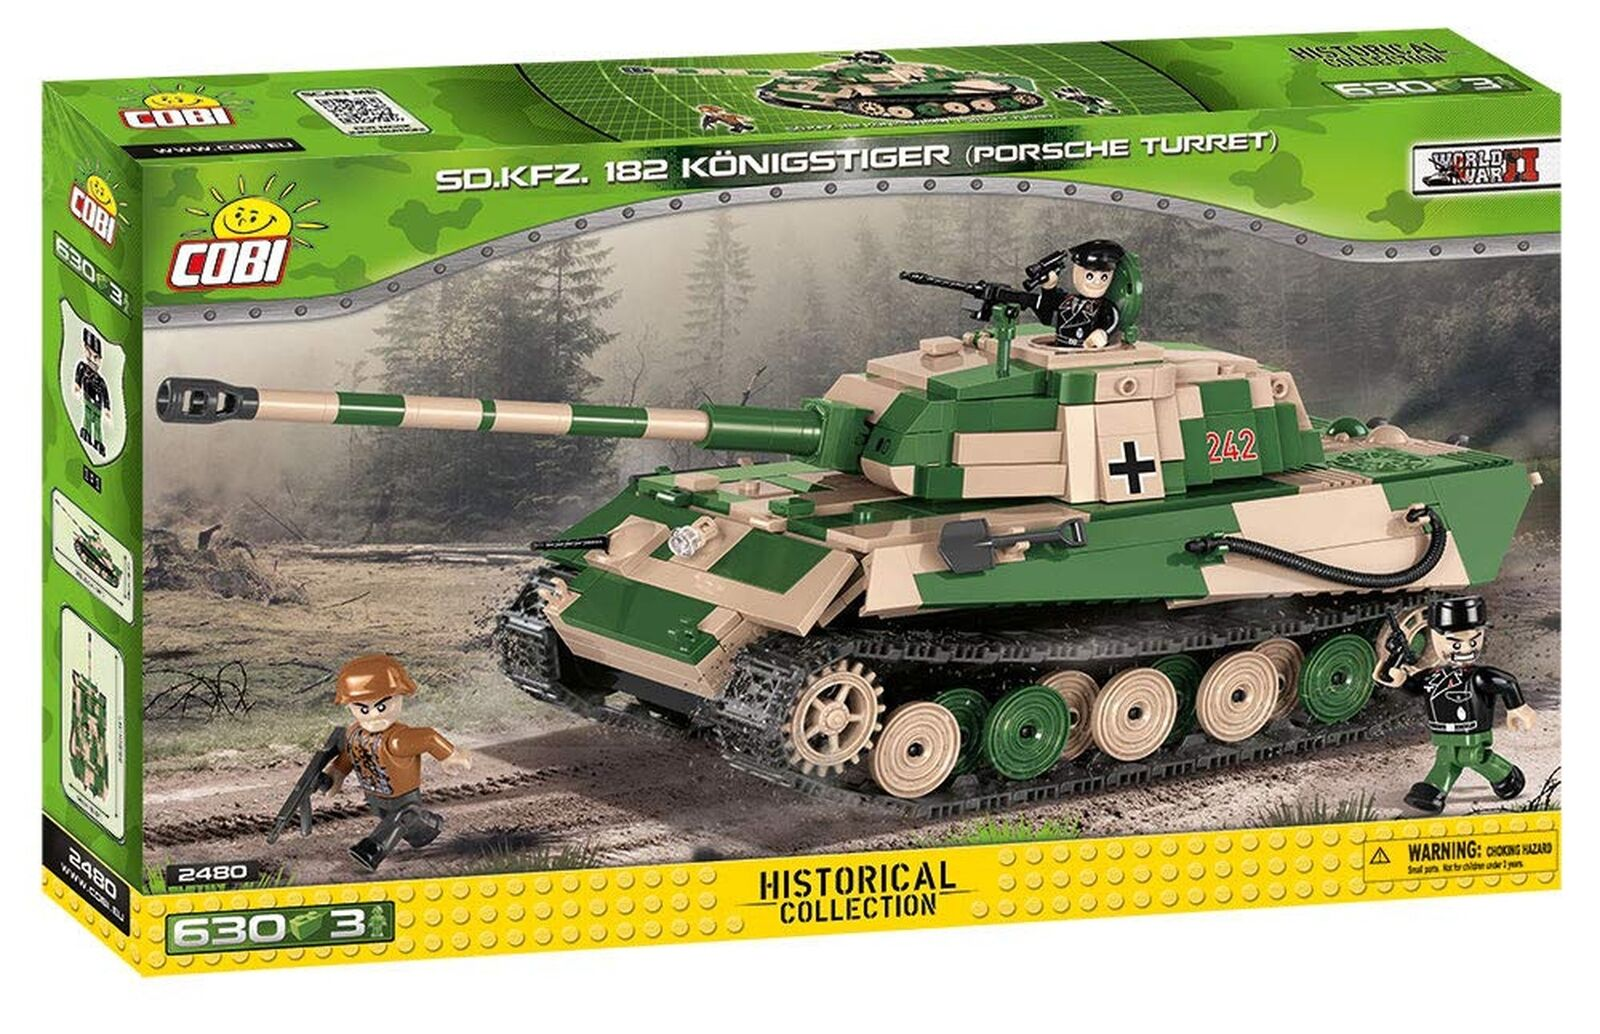 COBI 2480 Small Army Tiger VIB Pzkpfw Tiger Army II (600 Pcs) Toy, Beige 5288bc